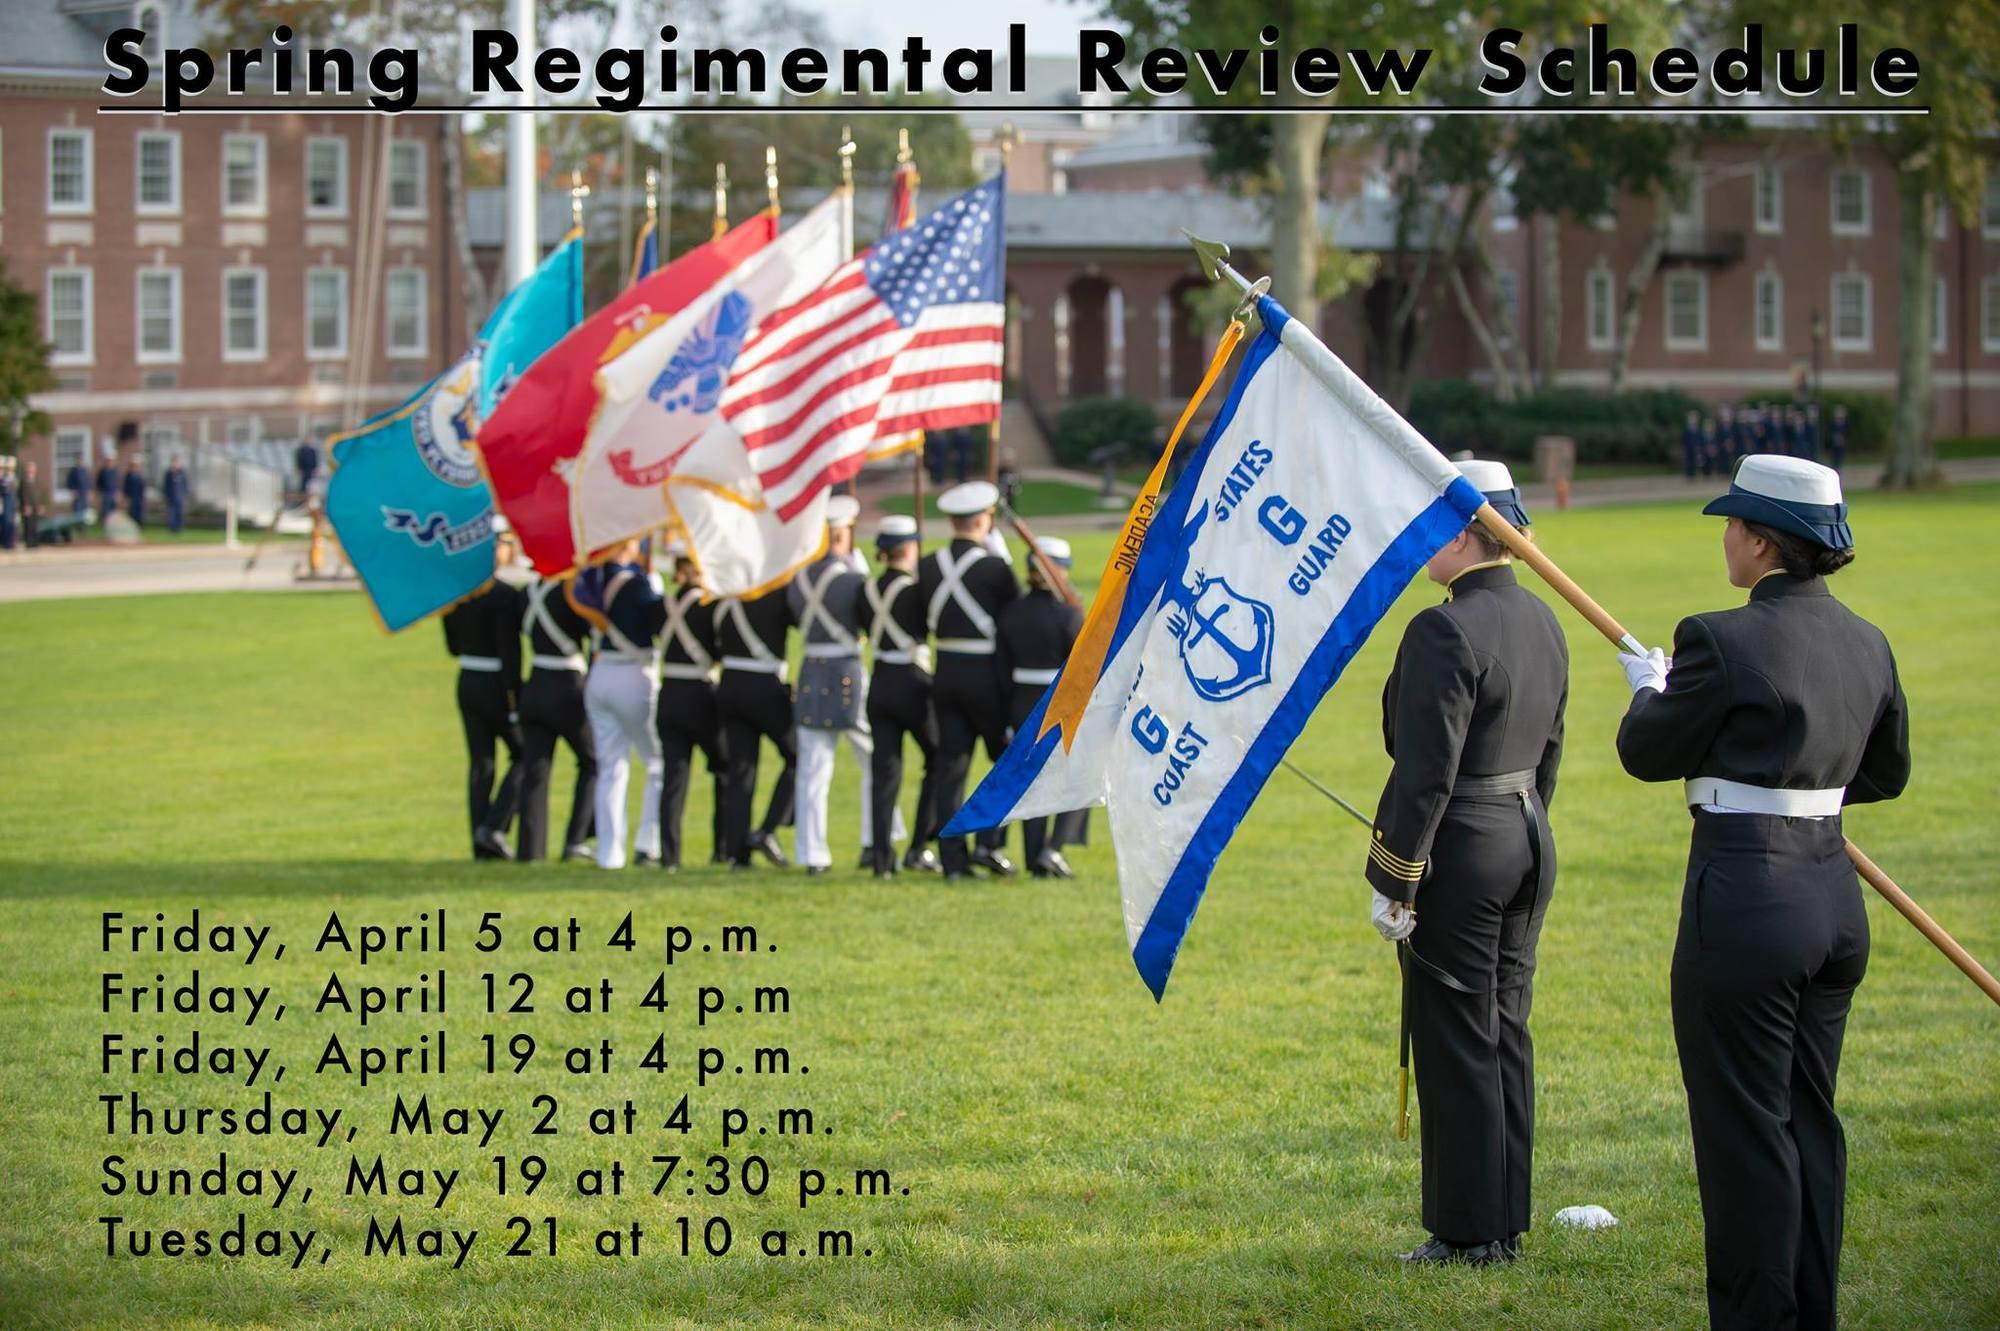 CGA Spring Regimental Review Schedule